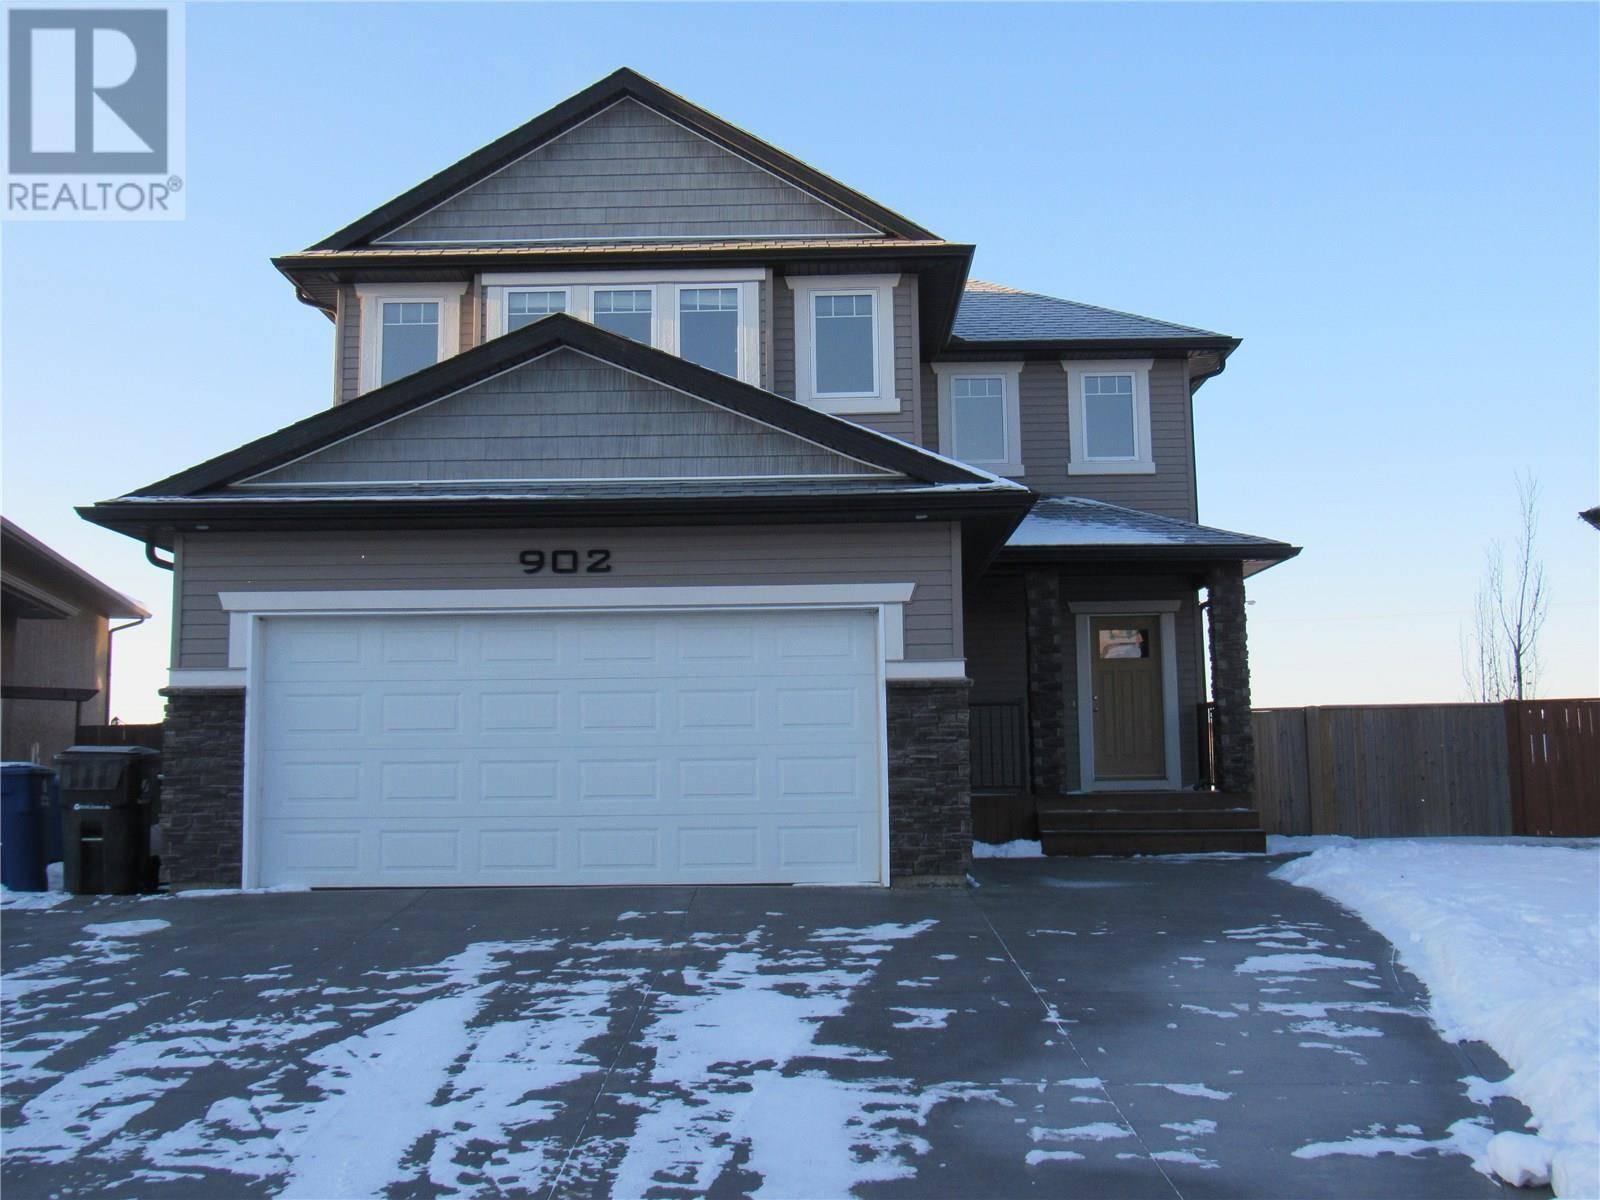 House for sale at 902 Wilkins Ct Saskatoon Saskatchewan - MLS: SK790922